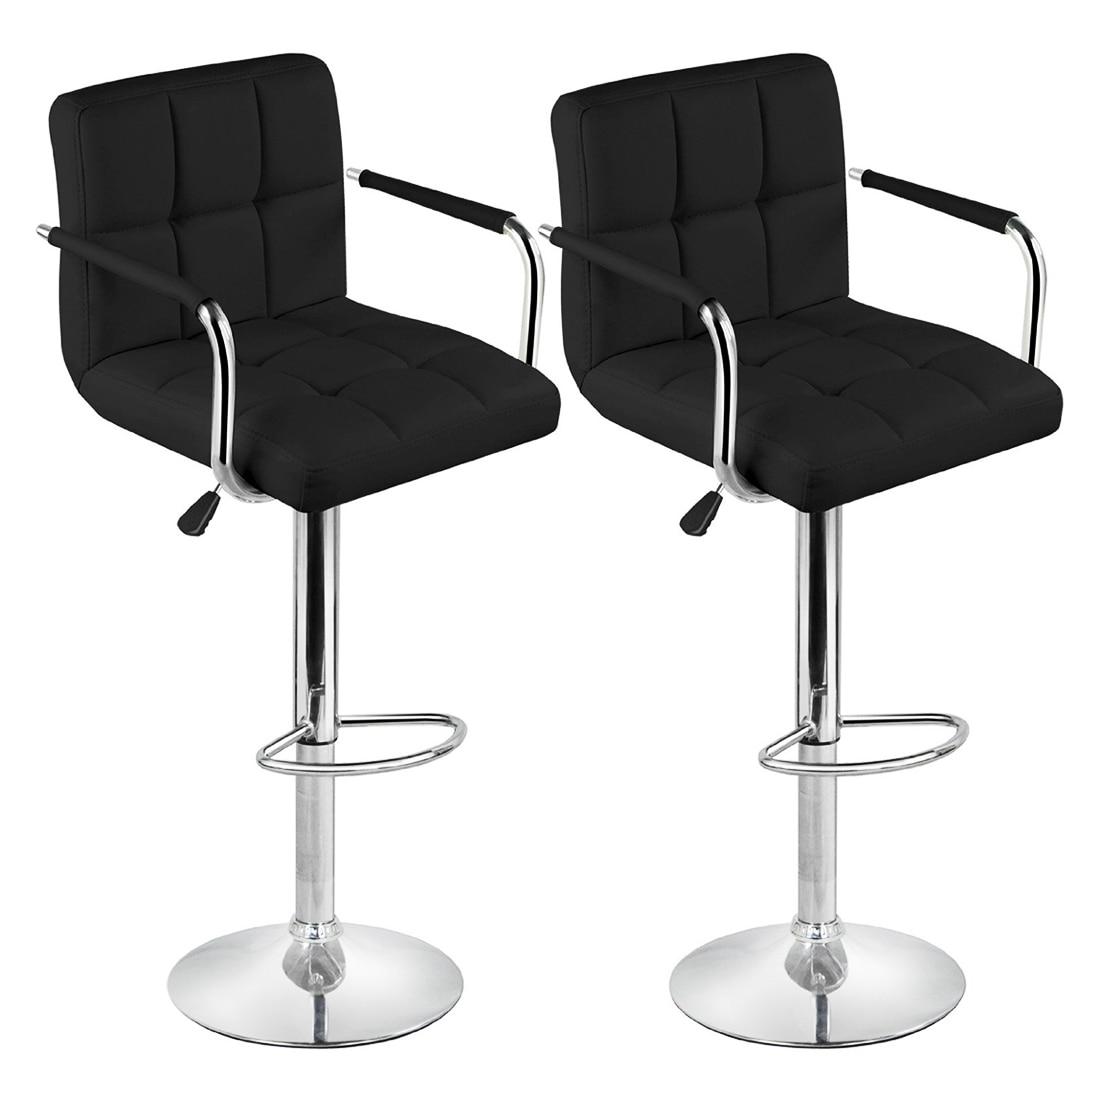 Swivel Chair Price Philippines Tot Spot Lawn Aliexpress Buy 2 Faux Leather Kitchen Breakfast Bar